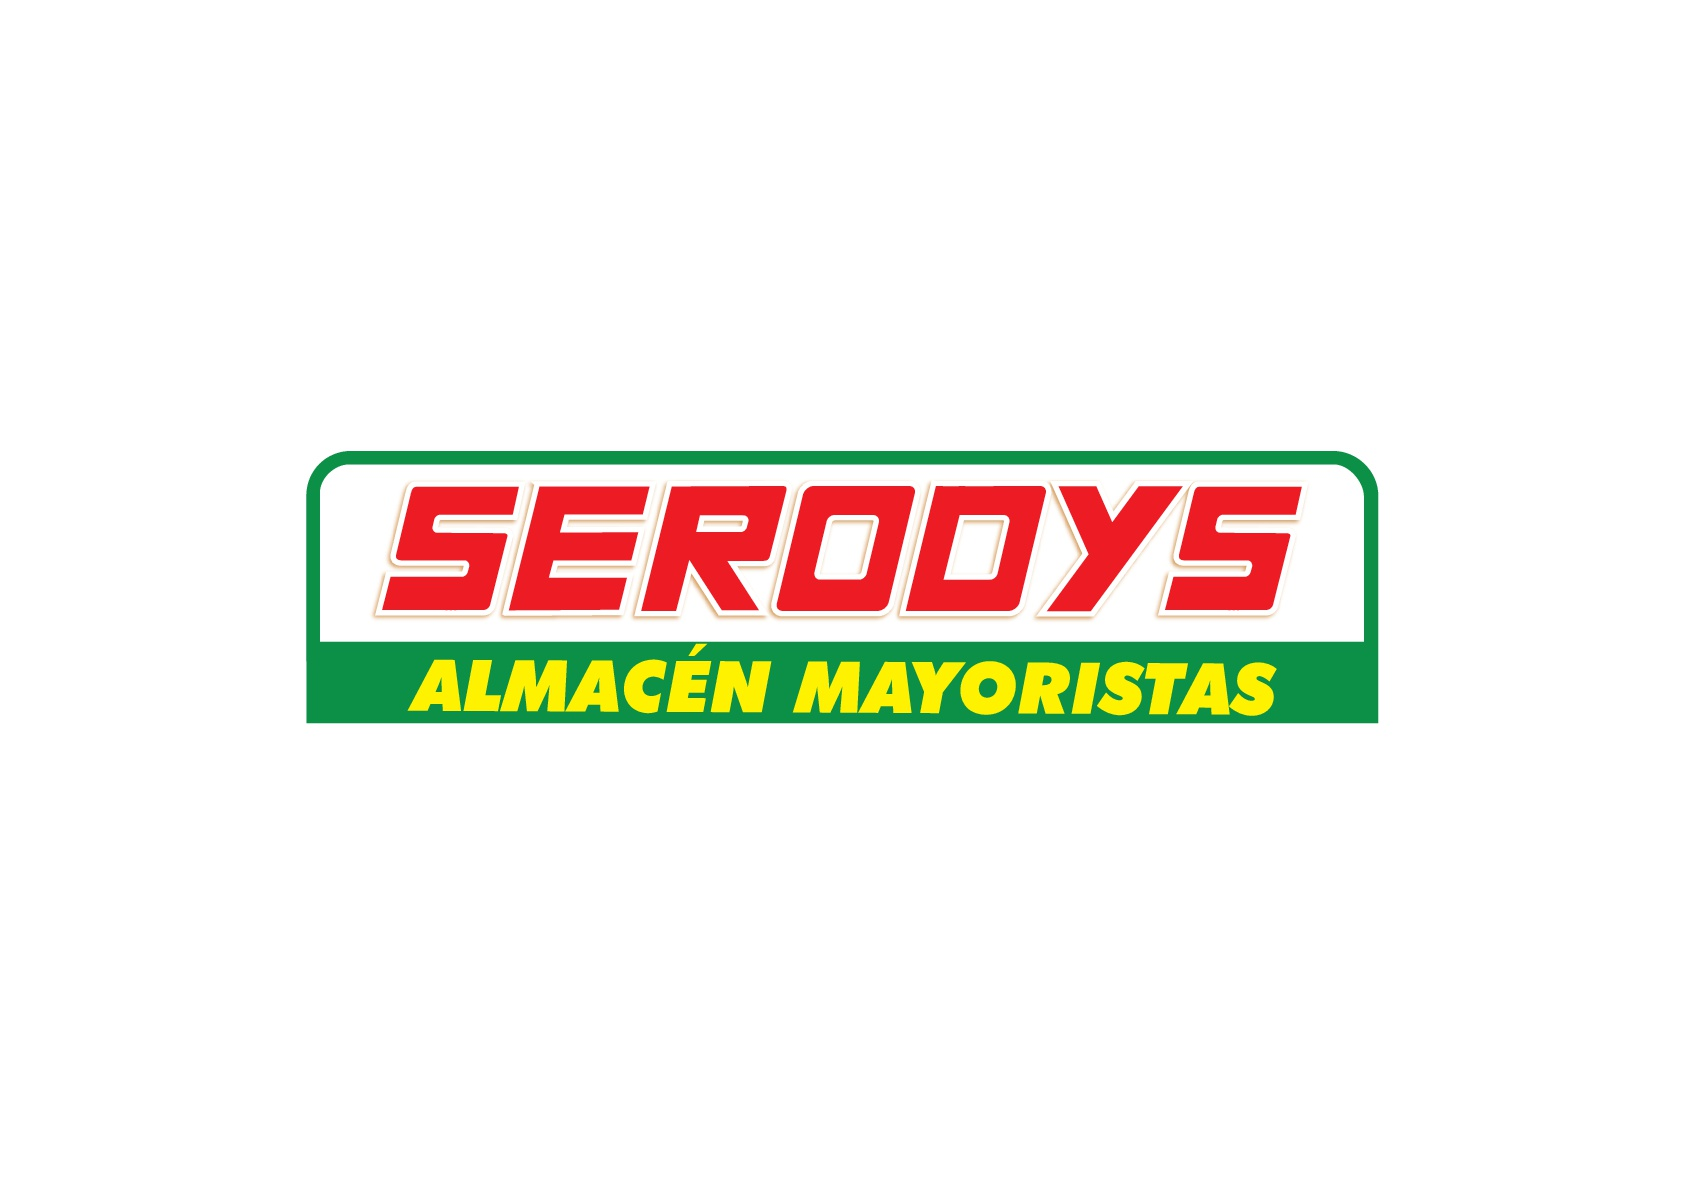 Serodys